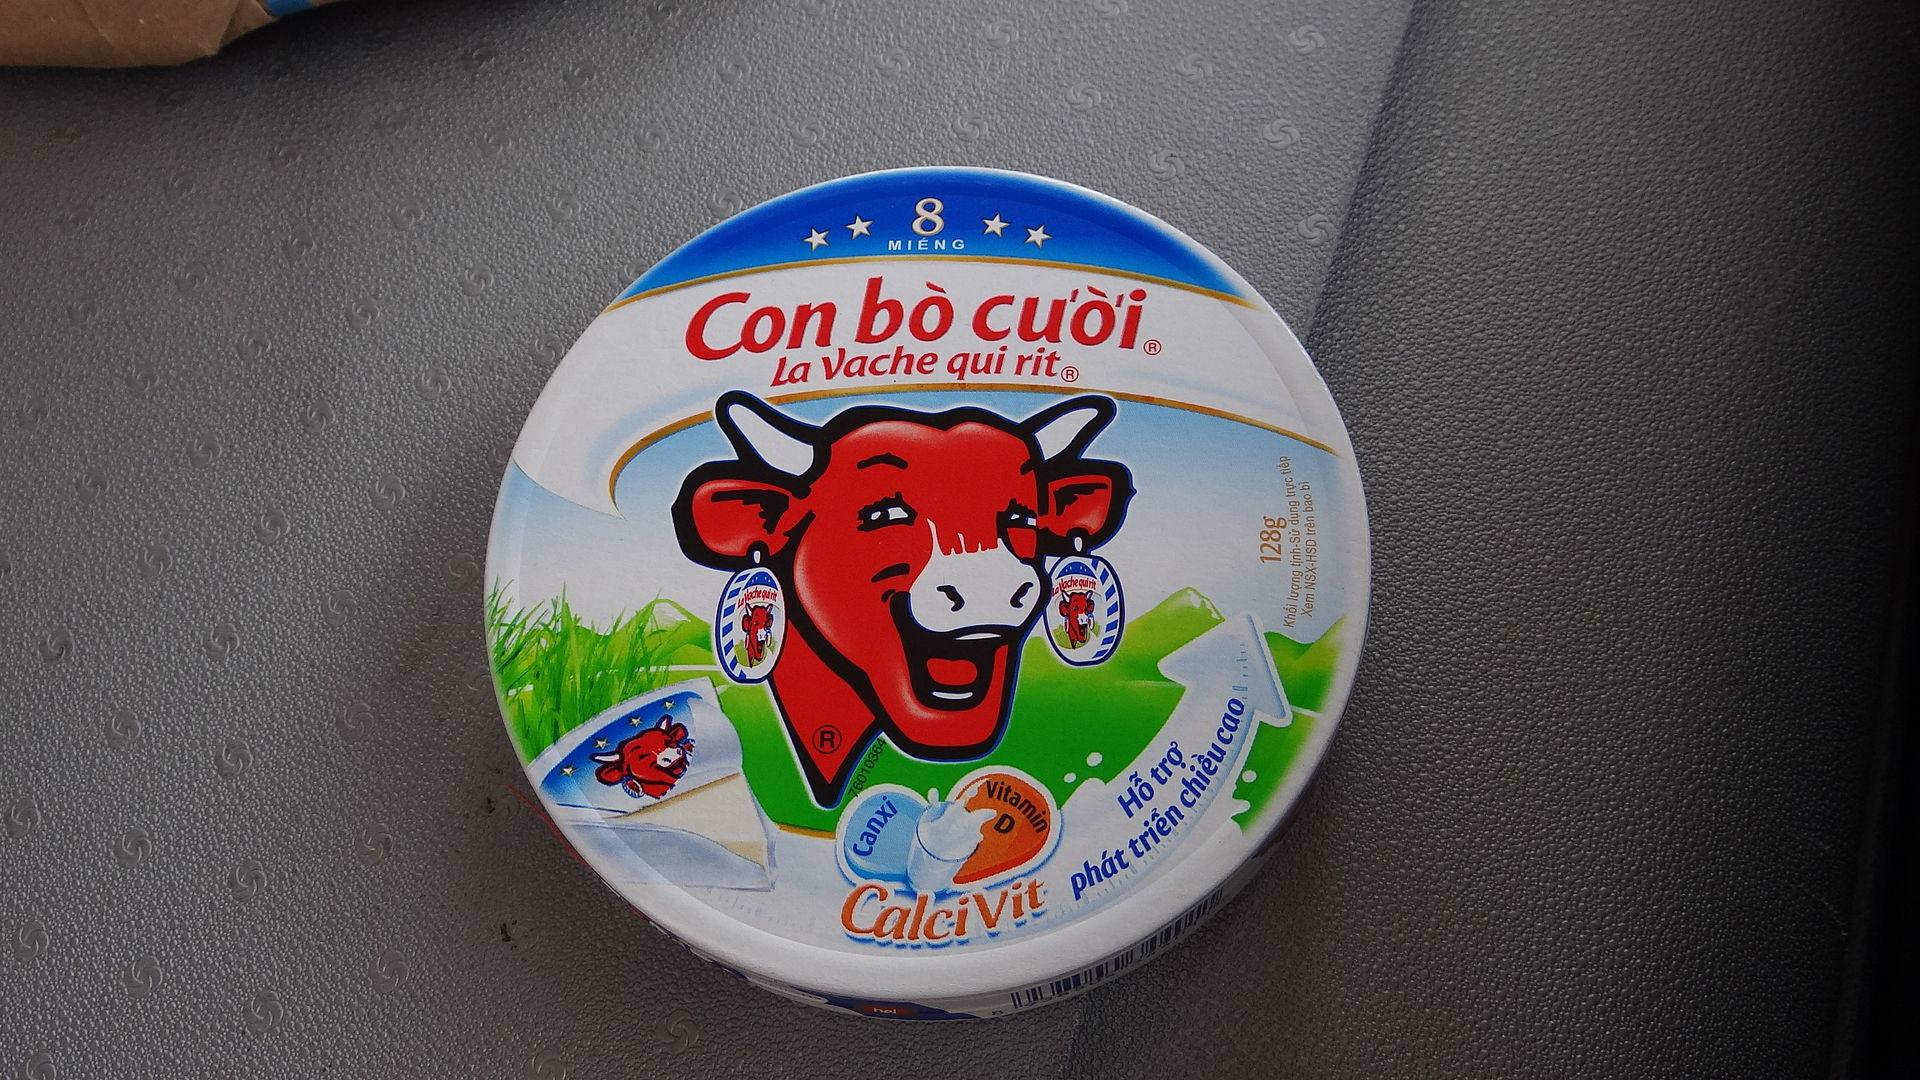 Con bò cười - La vache qui rit au Vietnam.JPG